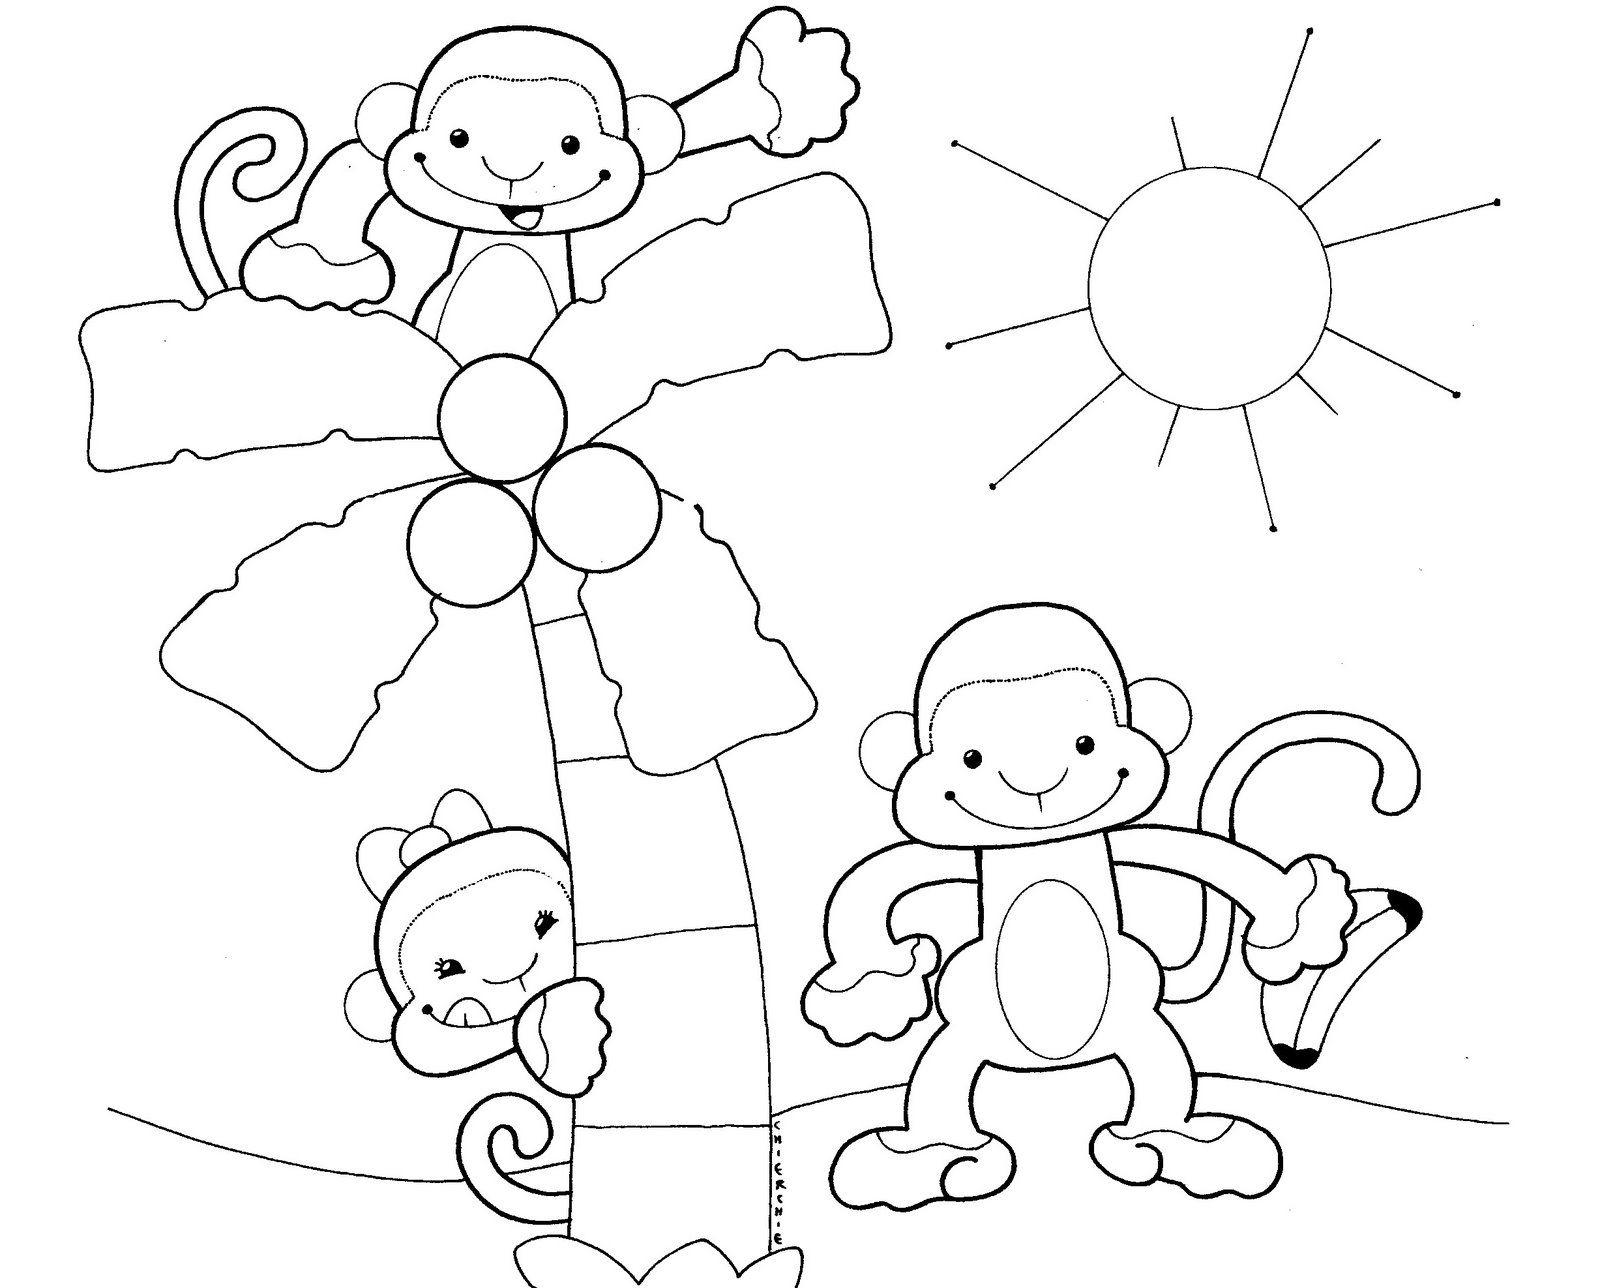 Animales de la selva caricatura para colorear - Imagui | Monkey ...